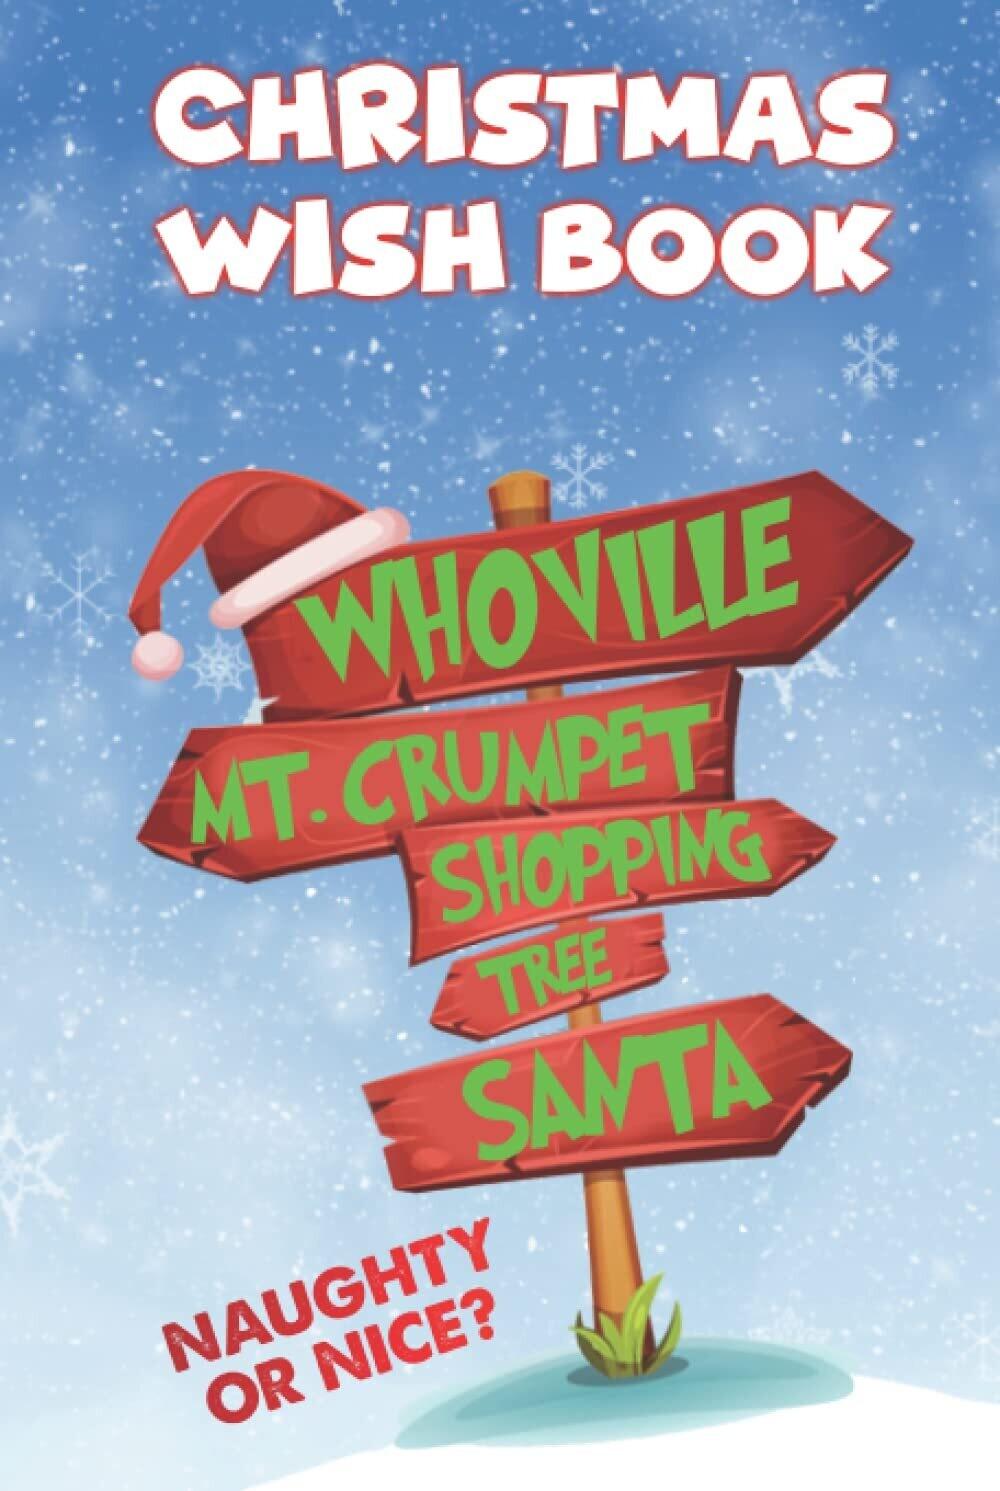 Christmas Wish Book [Naughty or Nice?] Whoville Harback Book - Christmas Gift Present Book Santa List